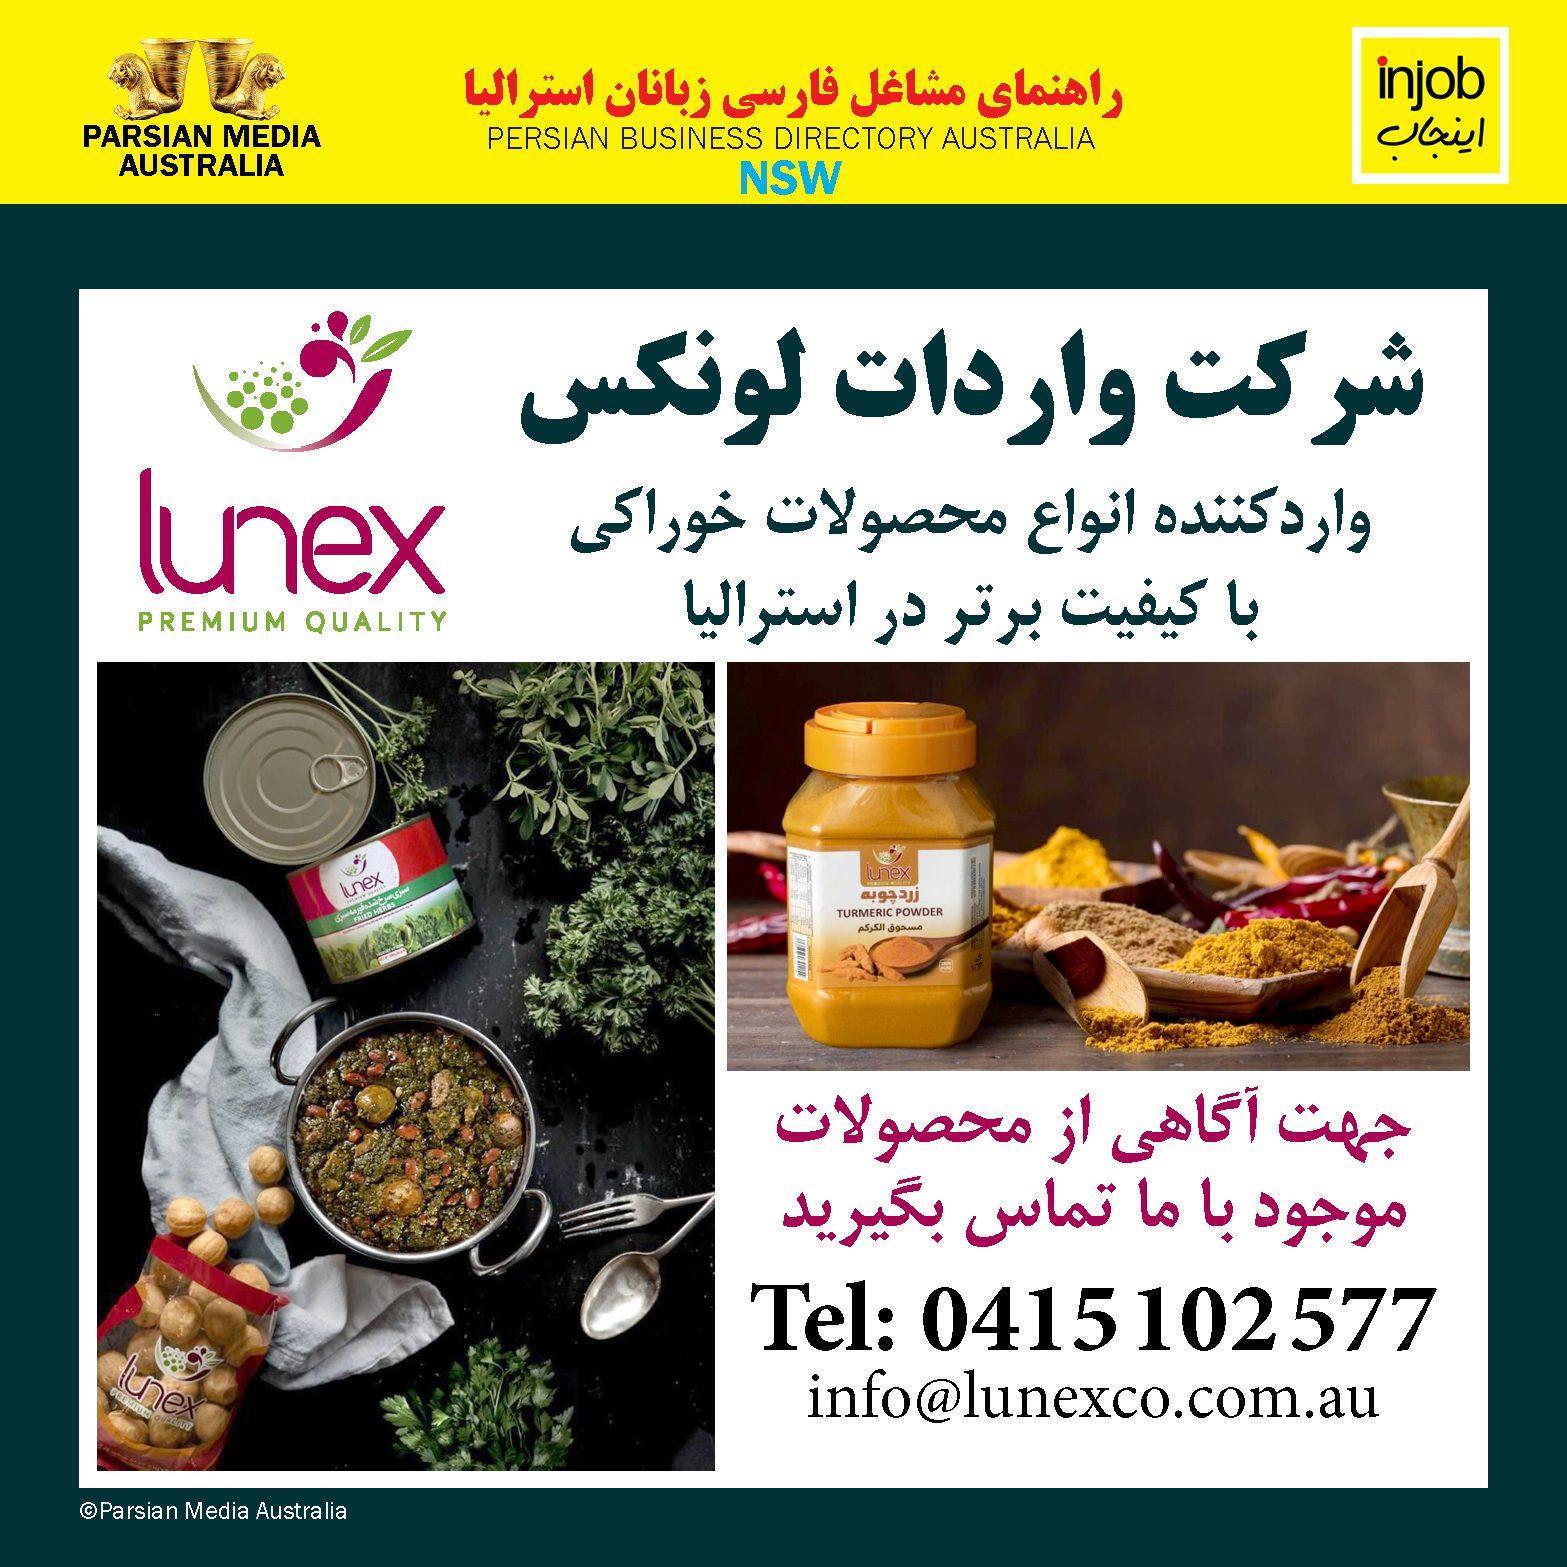 Lunex7-Injob-2021-2022-online.jpg